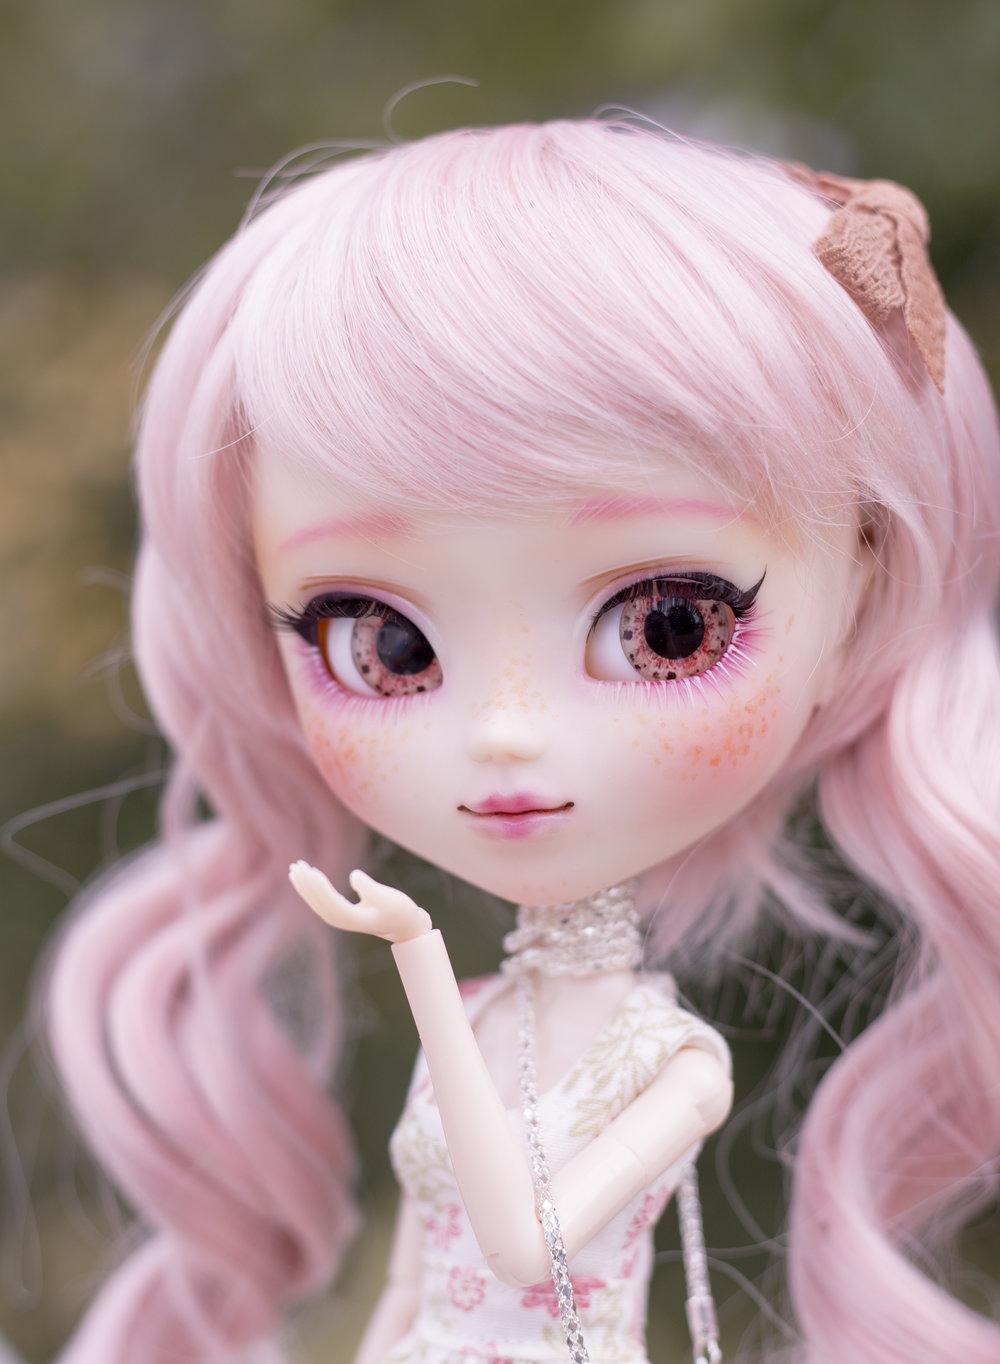 Sakura Jelly by Yummy Sweets Dolls